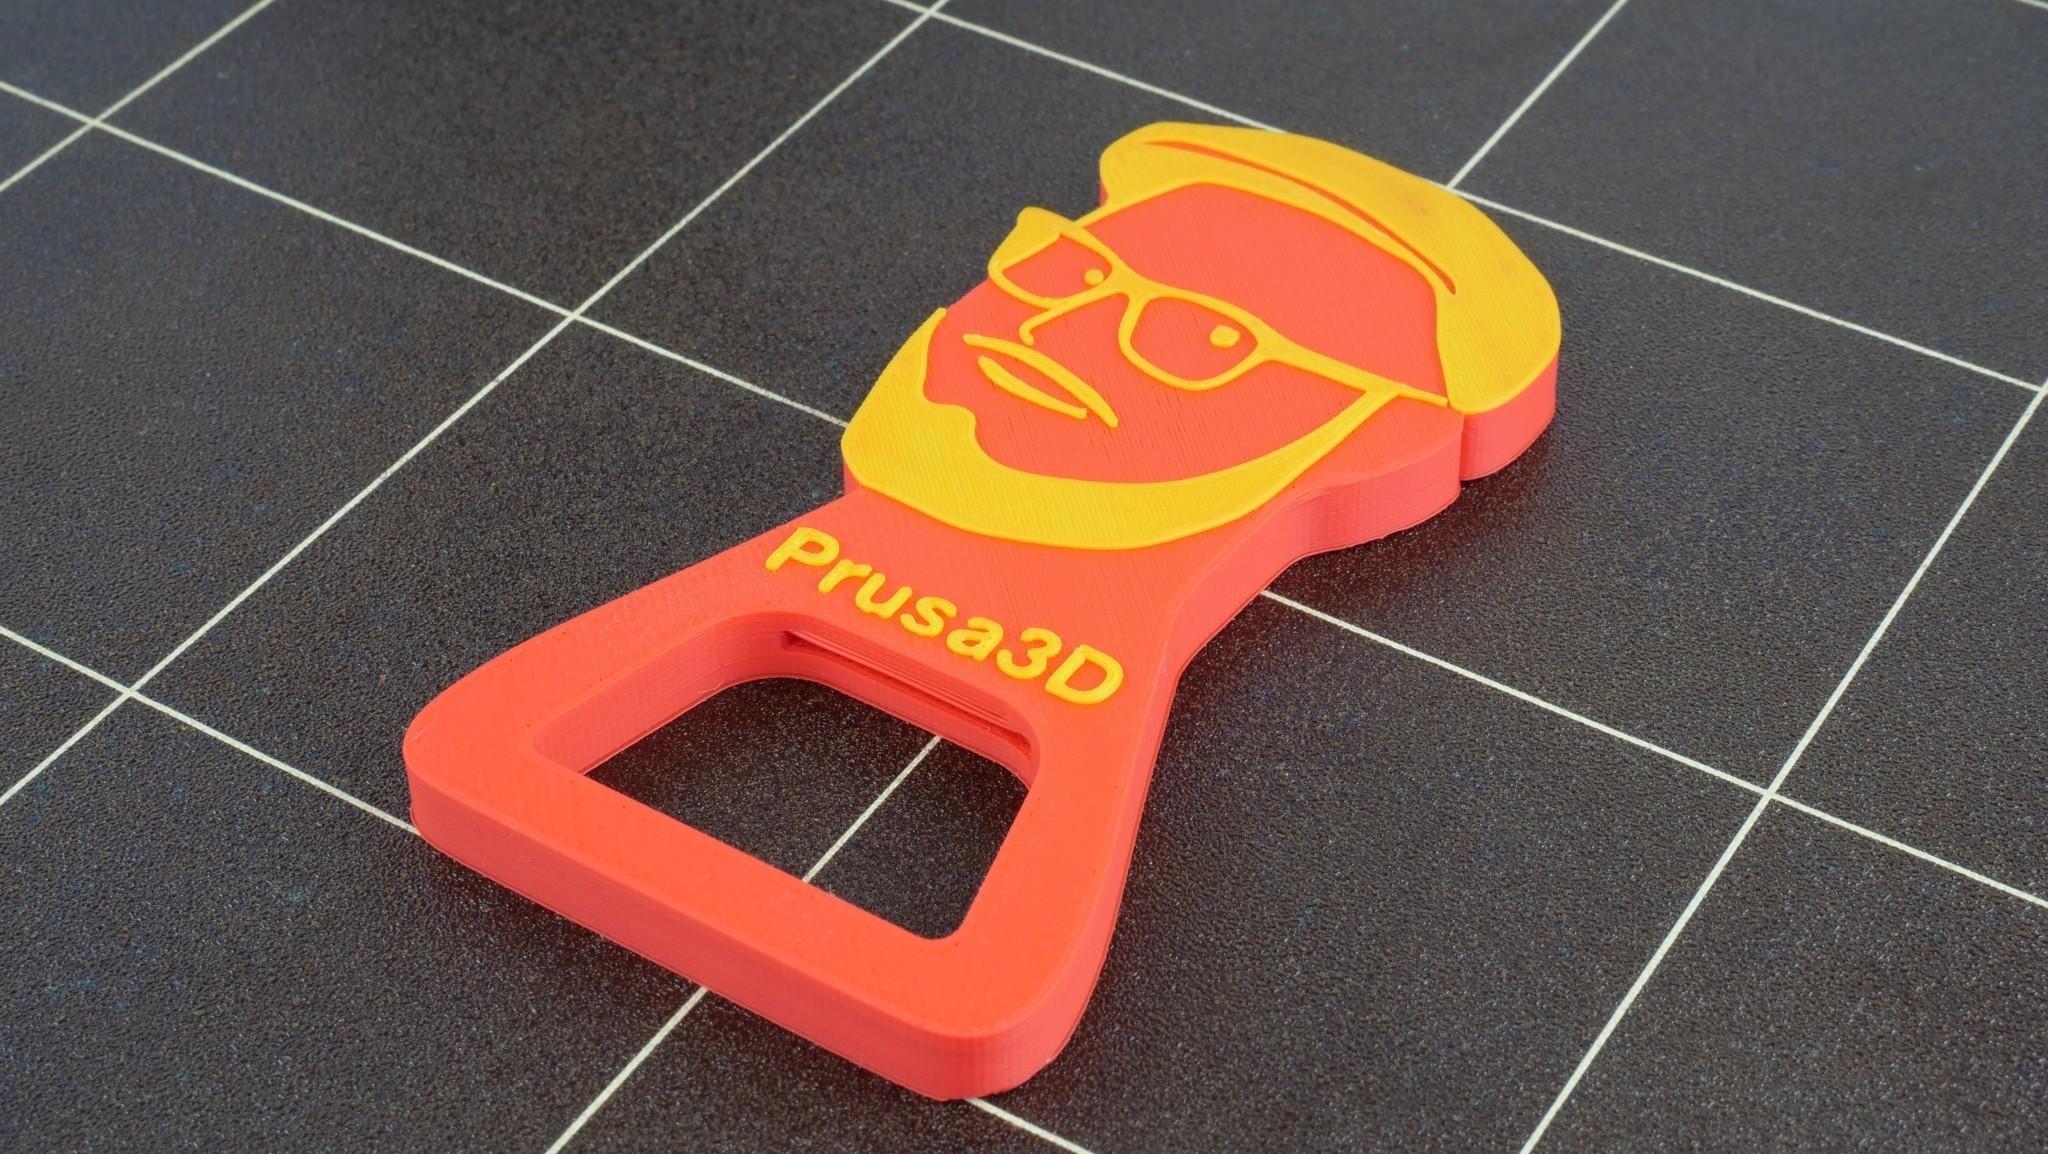 pepa_opener.jpg Download free STL file Josef Prusa Beer Opener • 3D printer model, cisardom